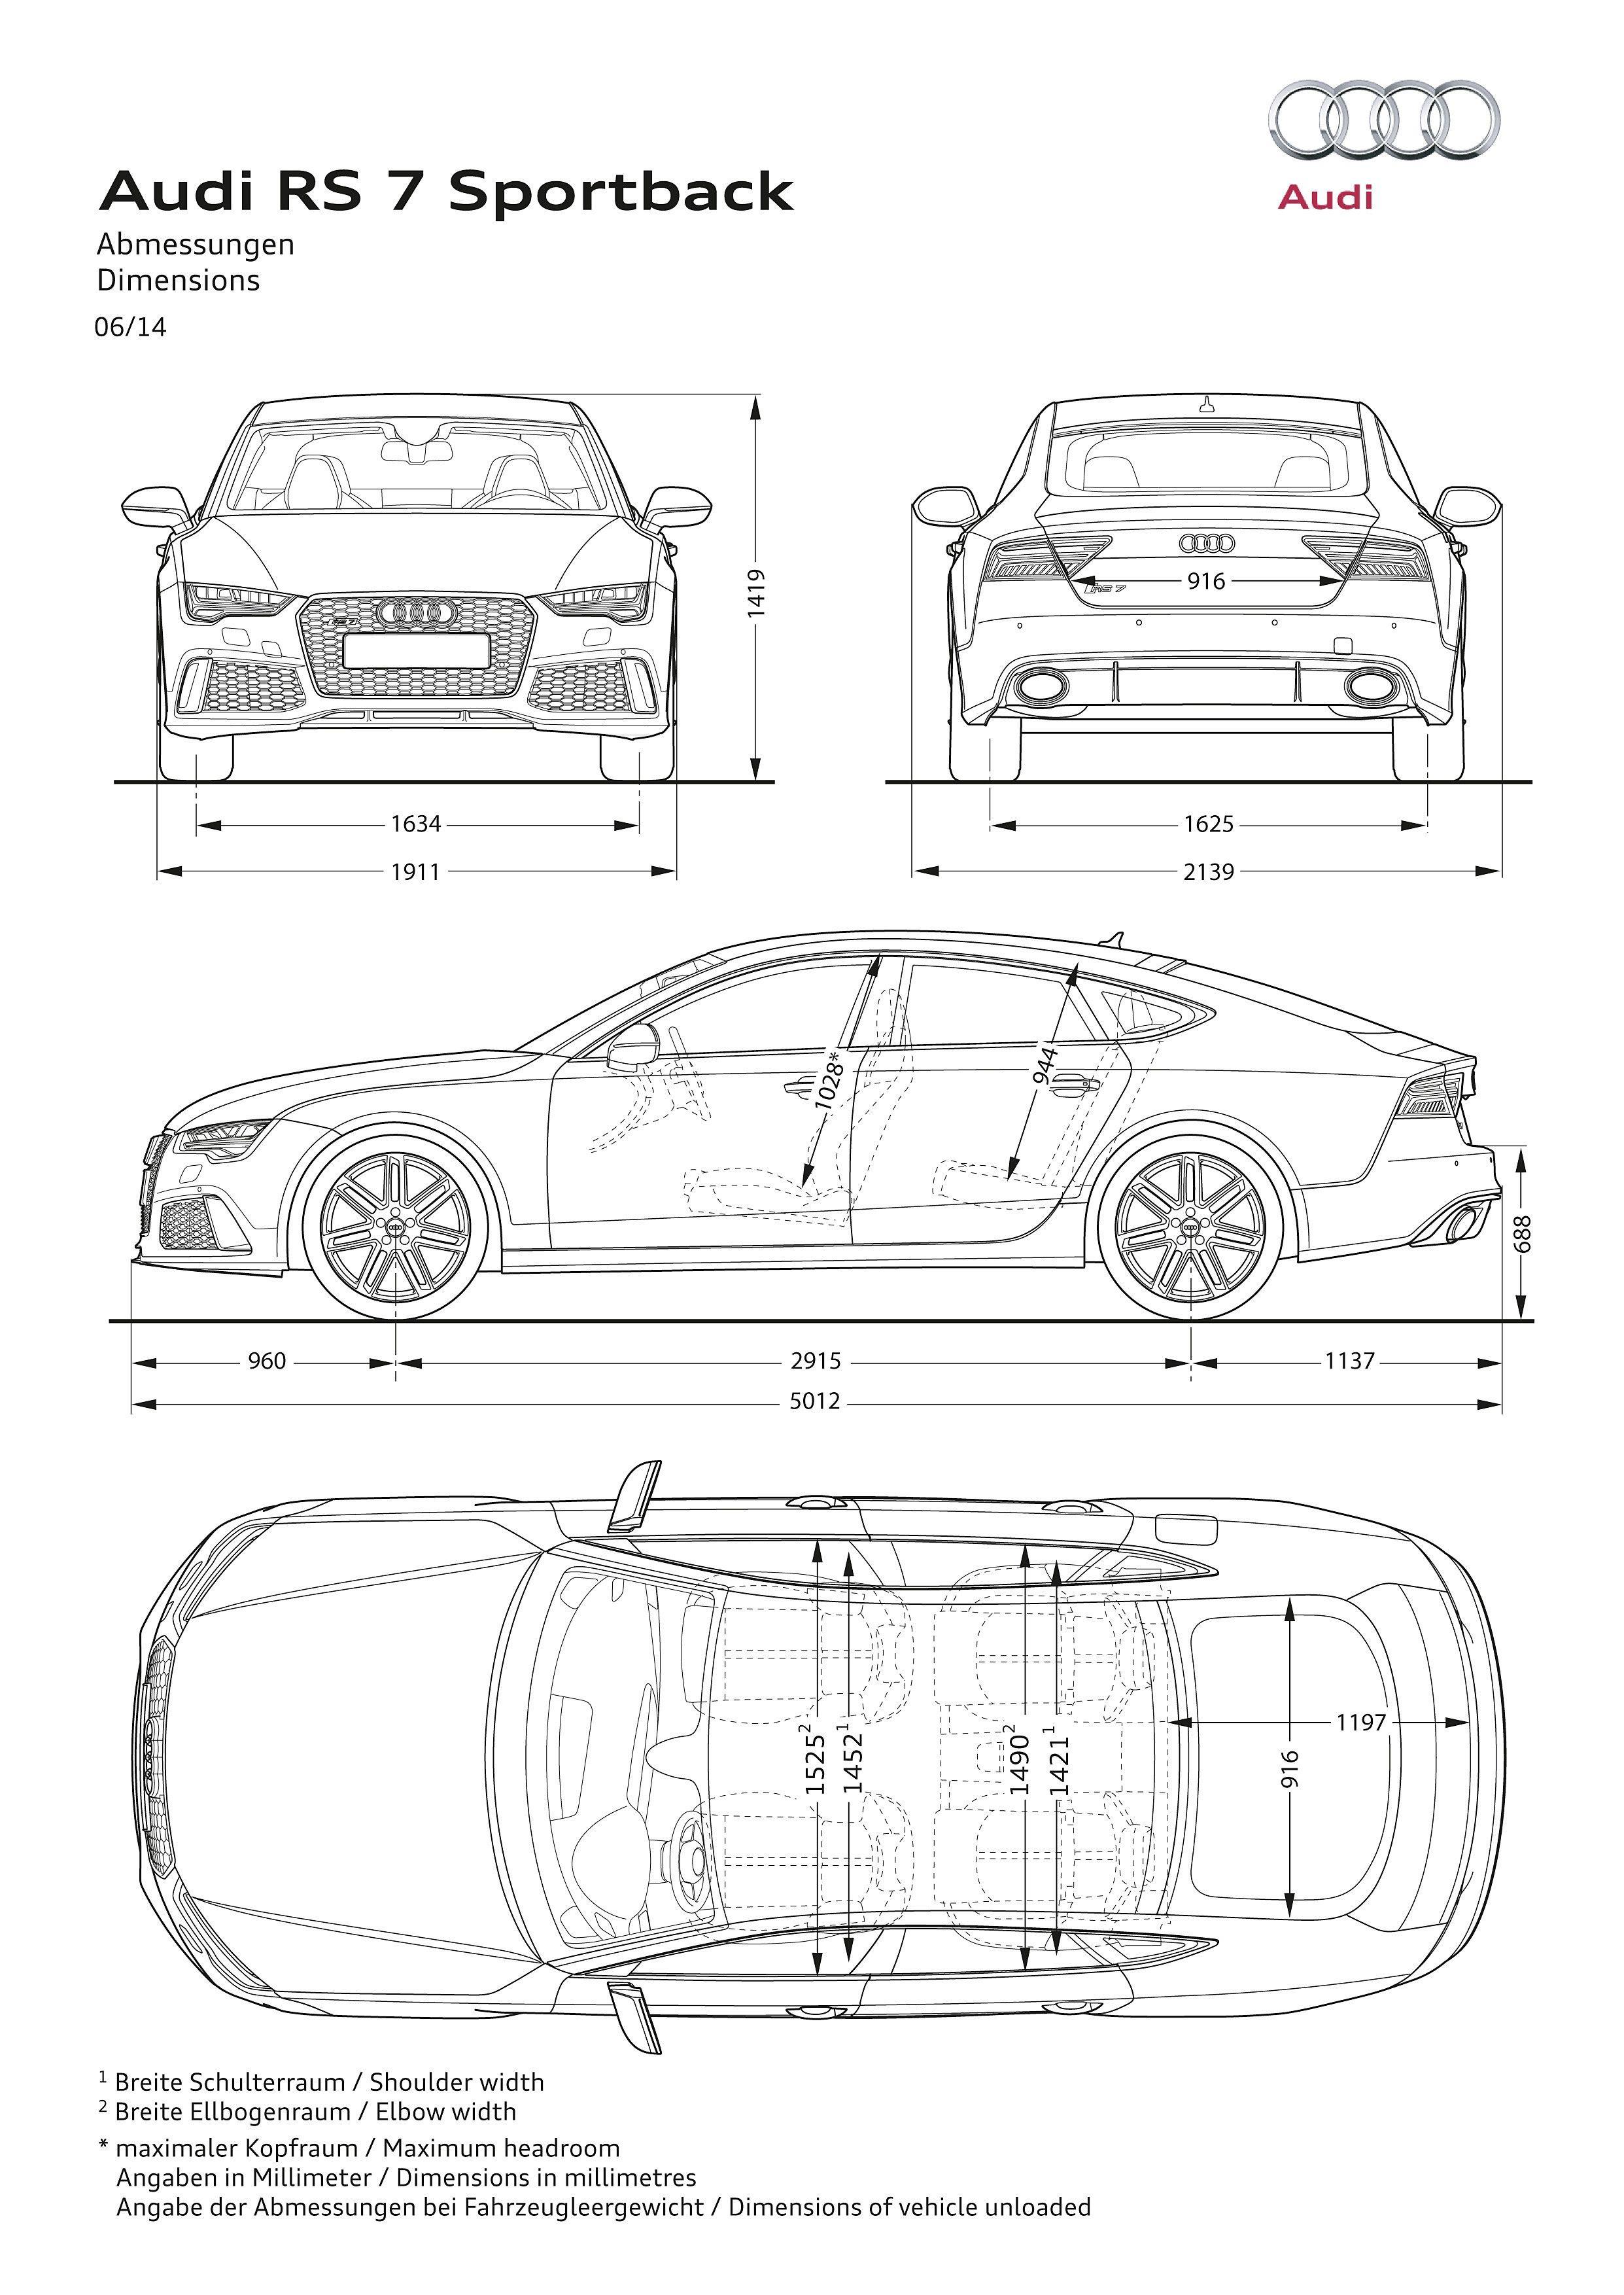 Audi Rs7 Sportbck